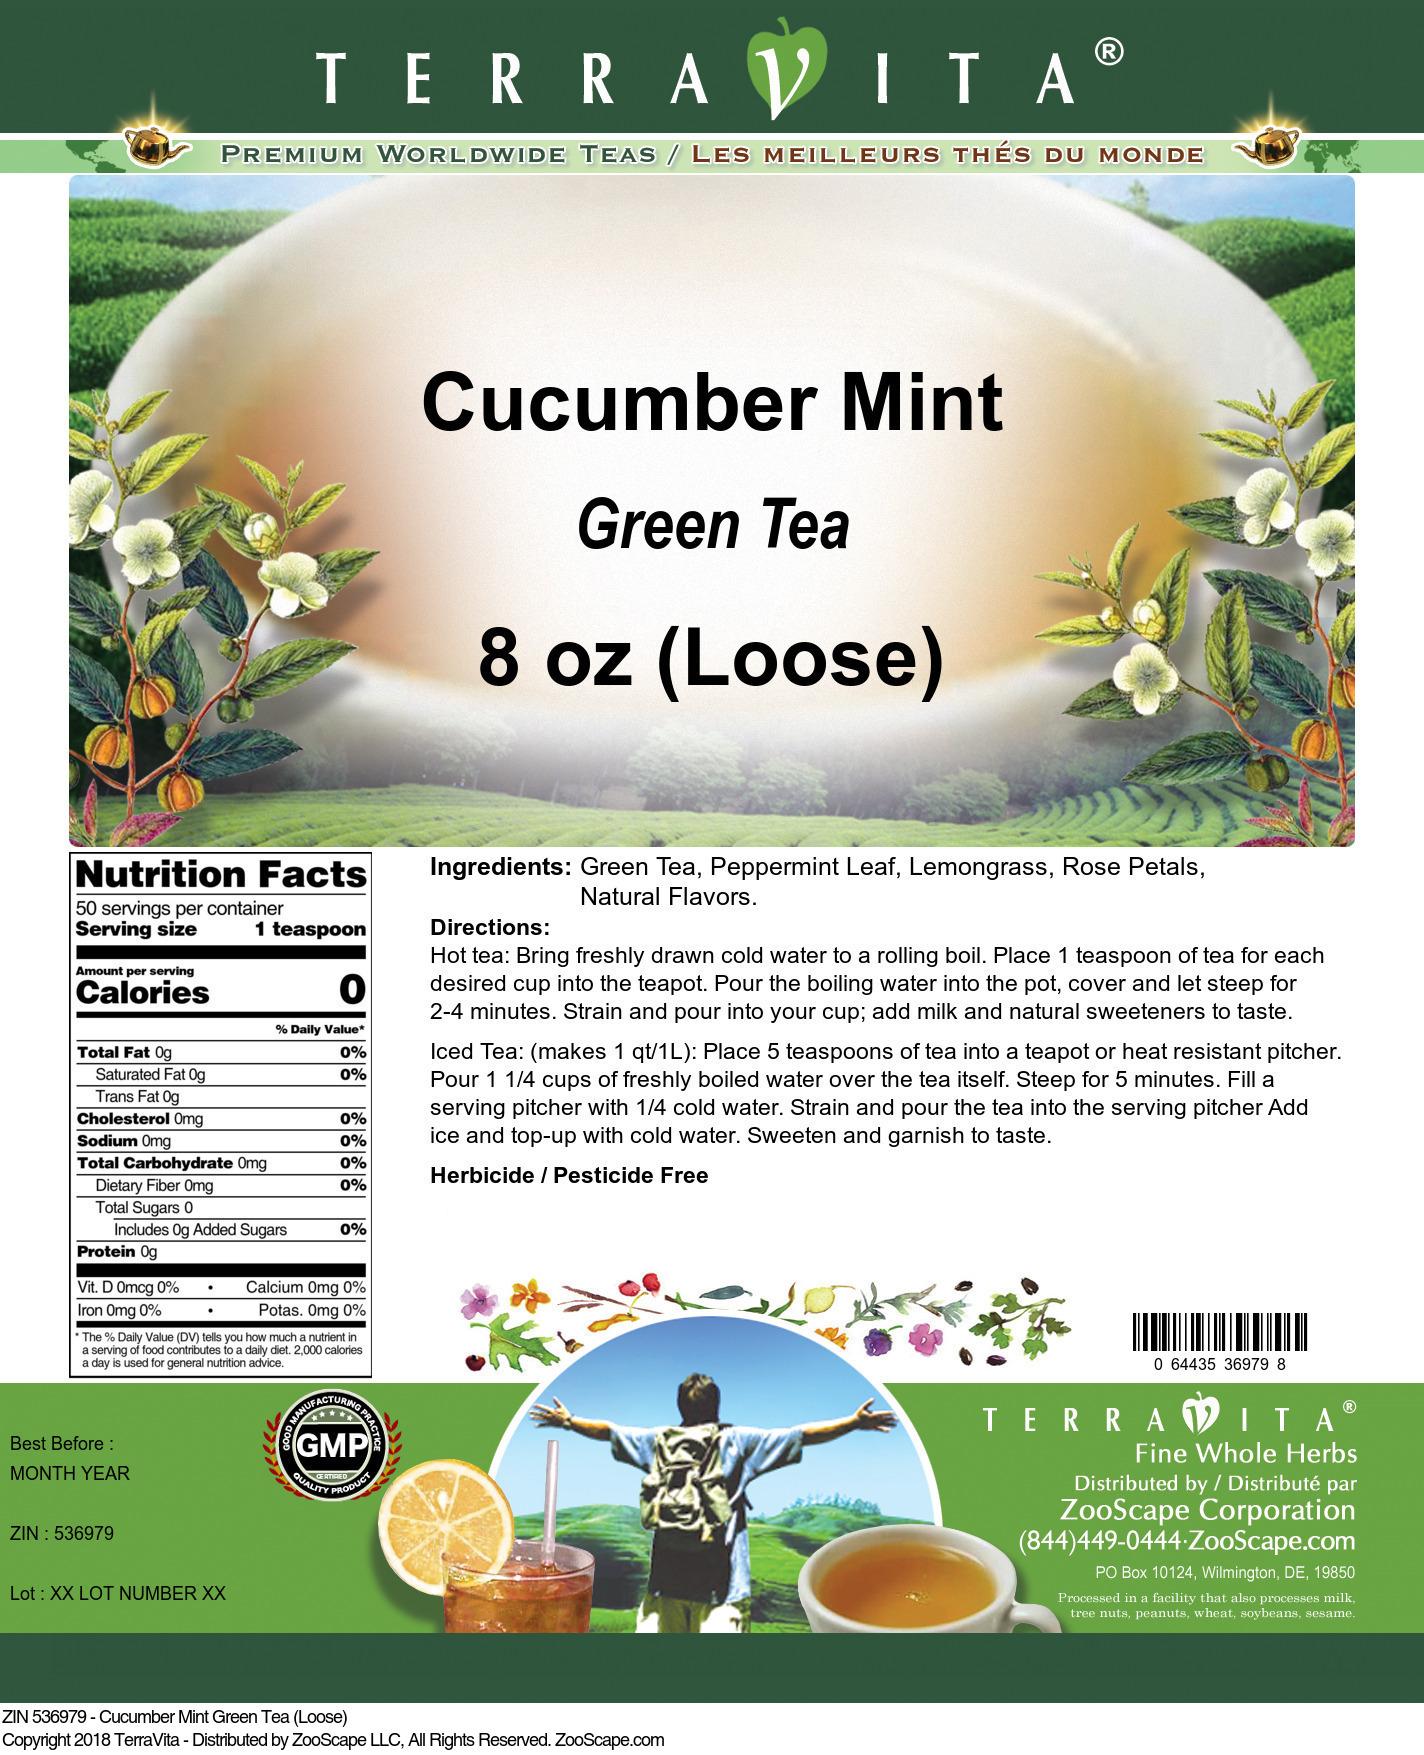 Cucumber Mint Green Tea (Loose)